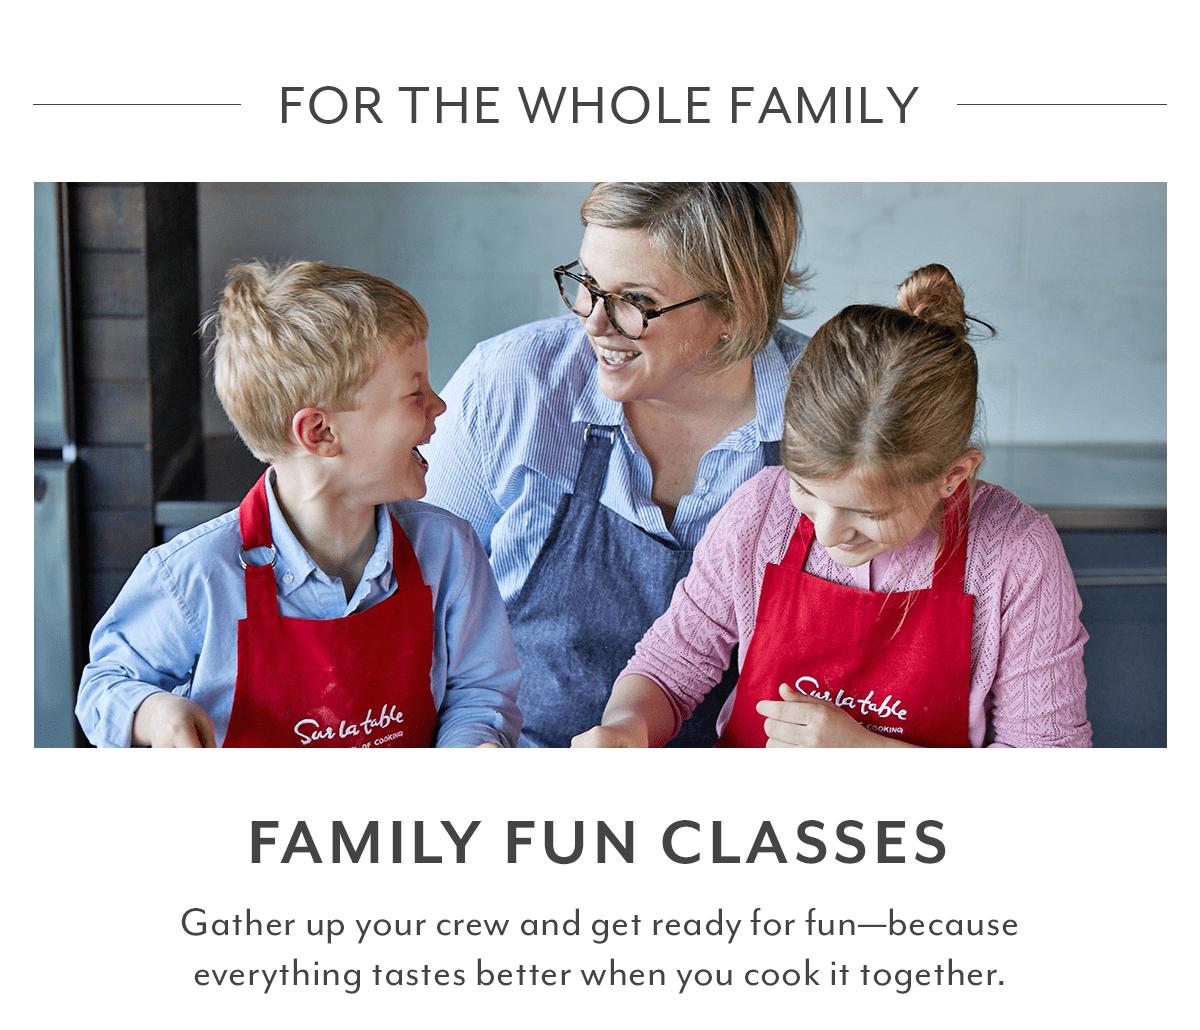 Family Fun Classes